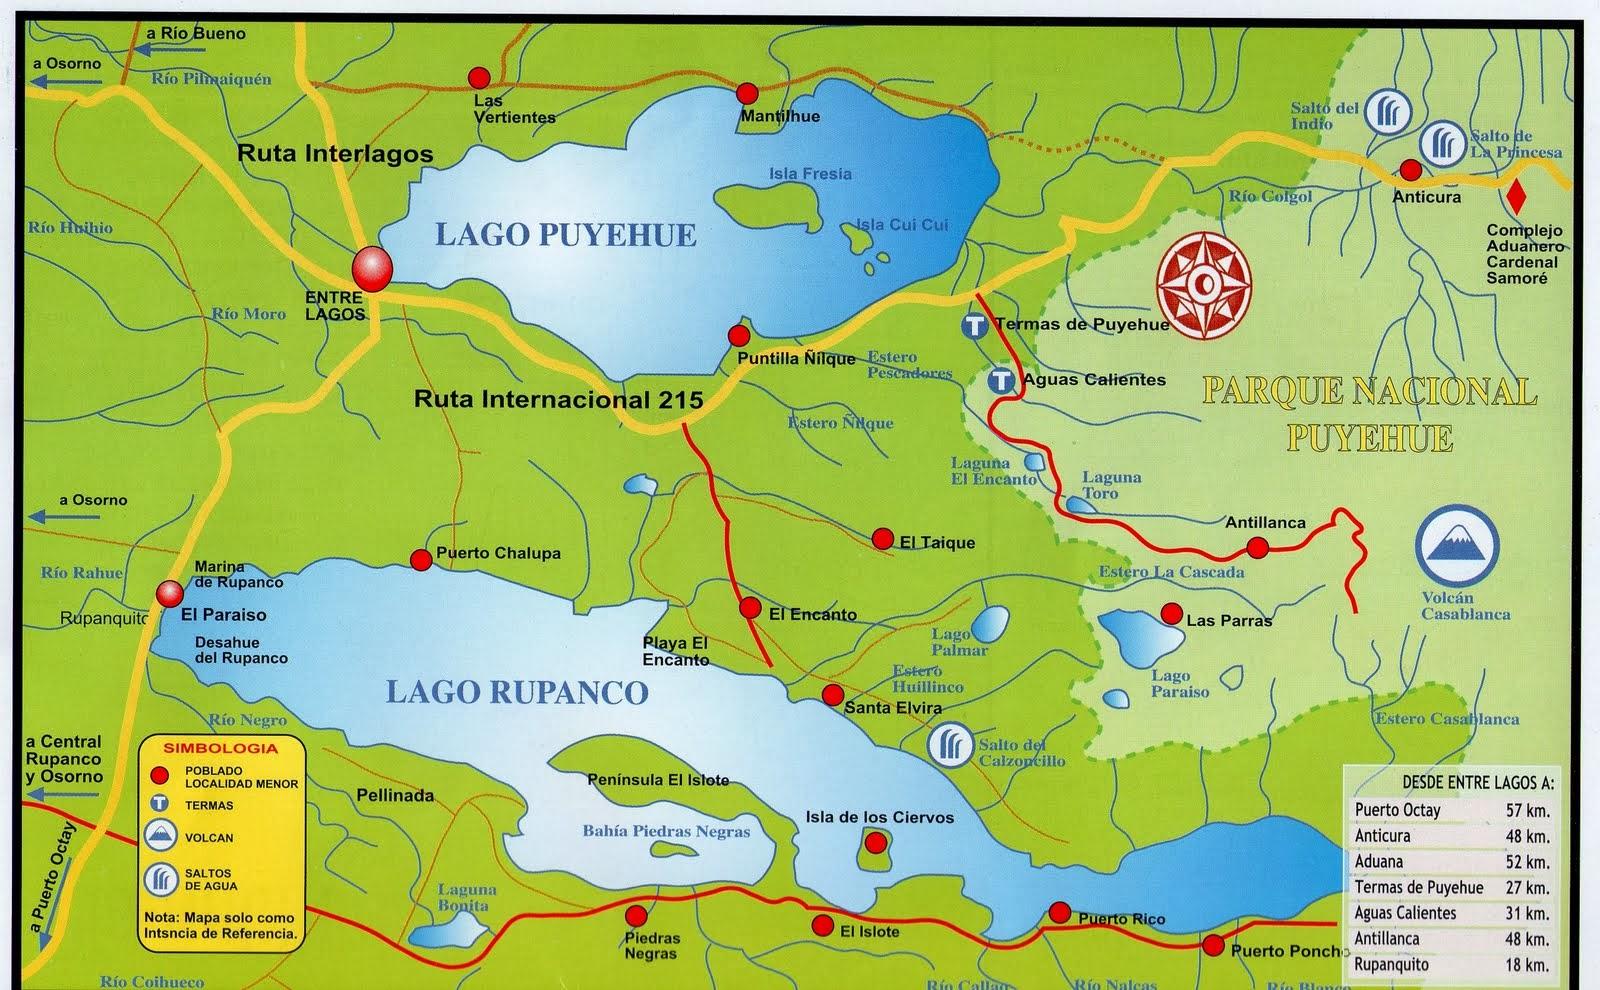 Parroquia virgen de f tima de entre lagos for Como llegar al ministerio del interior